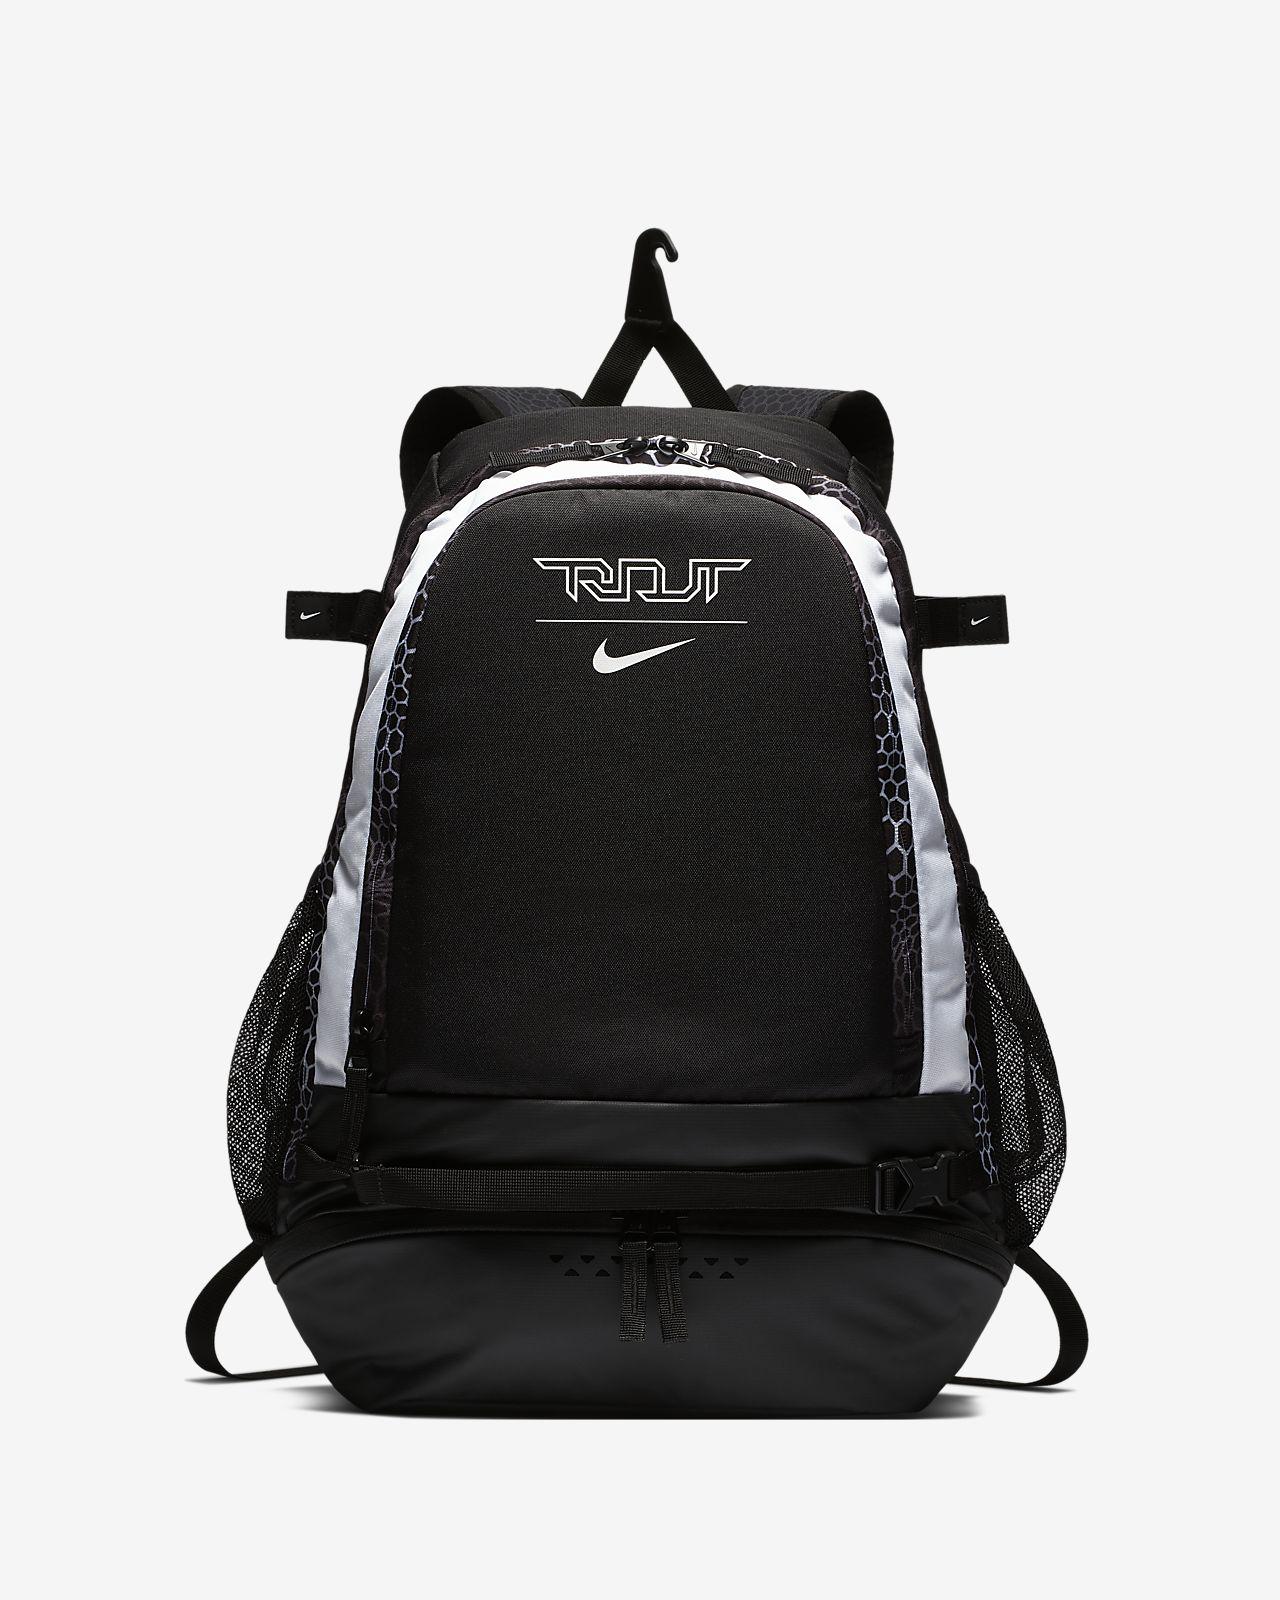 Nike Trout Vapor Baseball Backpack